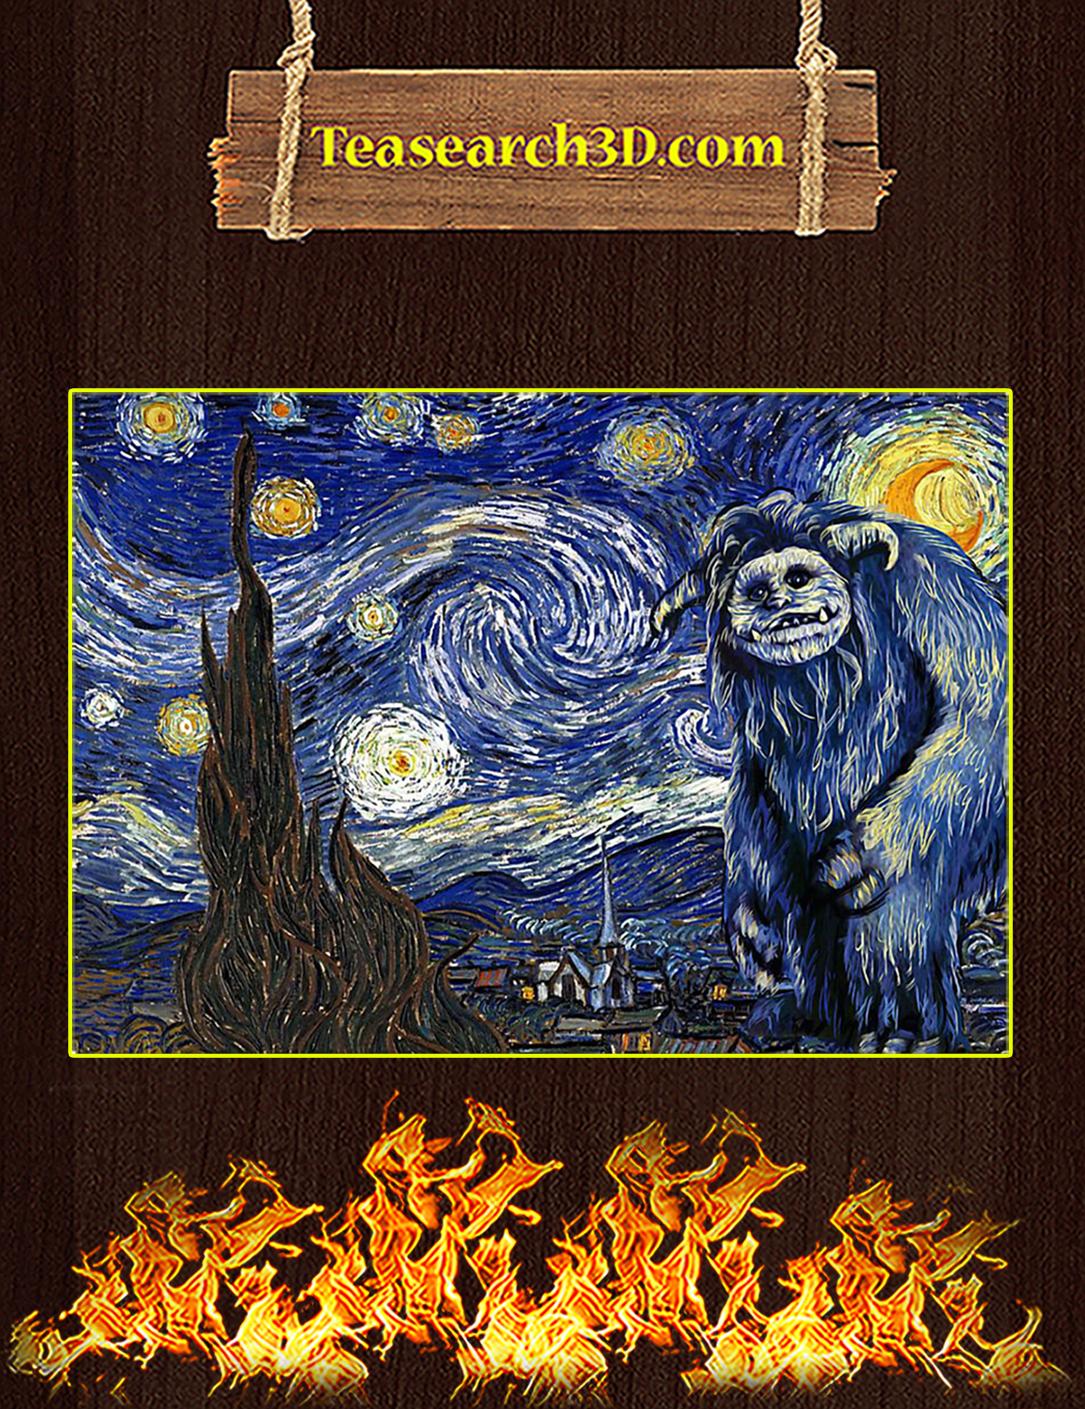 Labyrinth ludo starry night van gogh poster A2